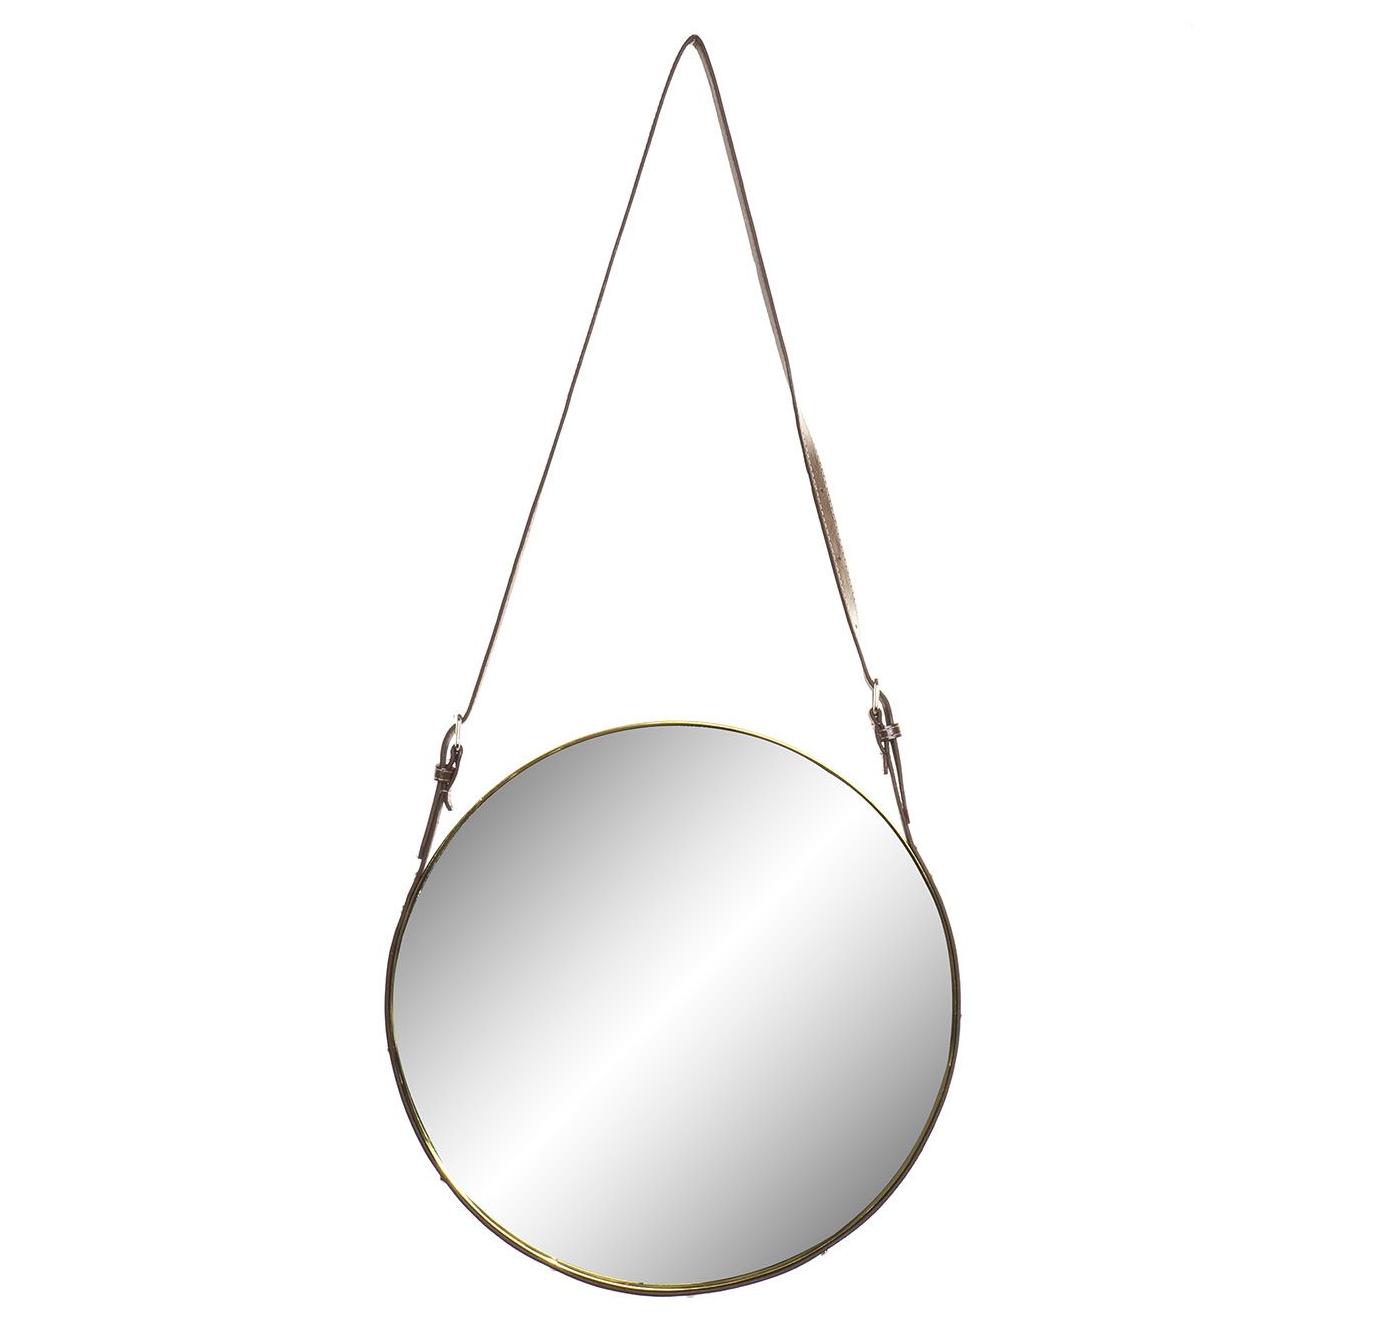 30018-espejo-colgante-cinturon.png